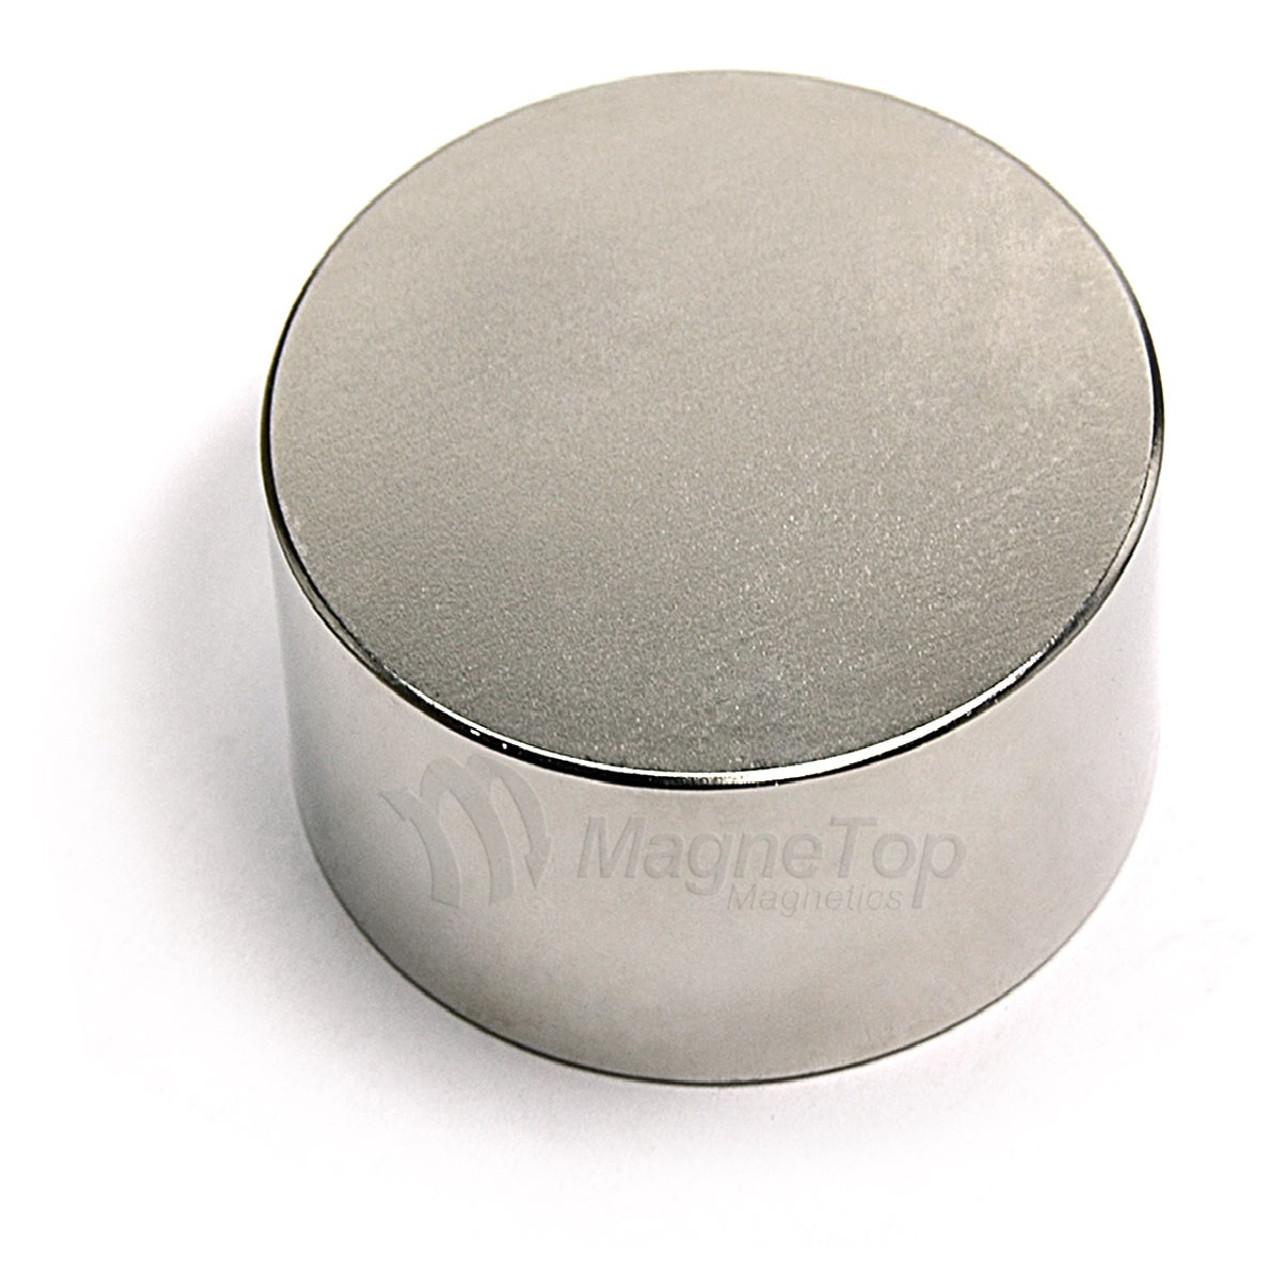 Neodymium Disk  -  50mm x 30mm - N42